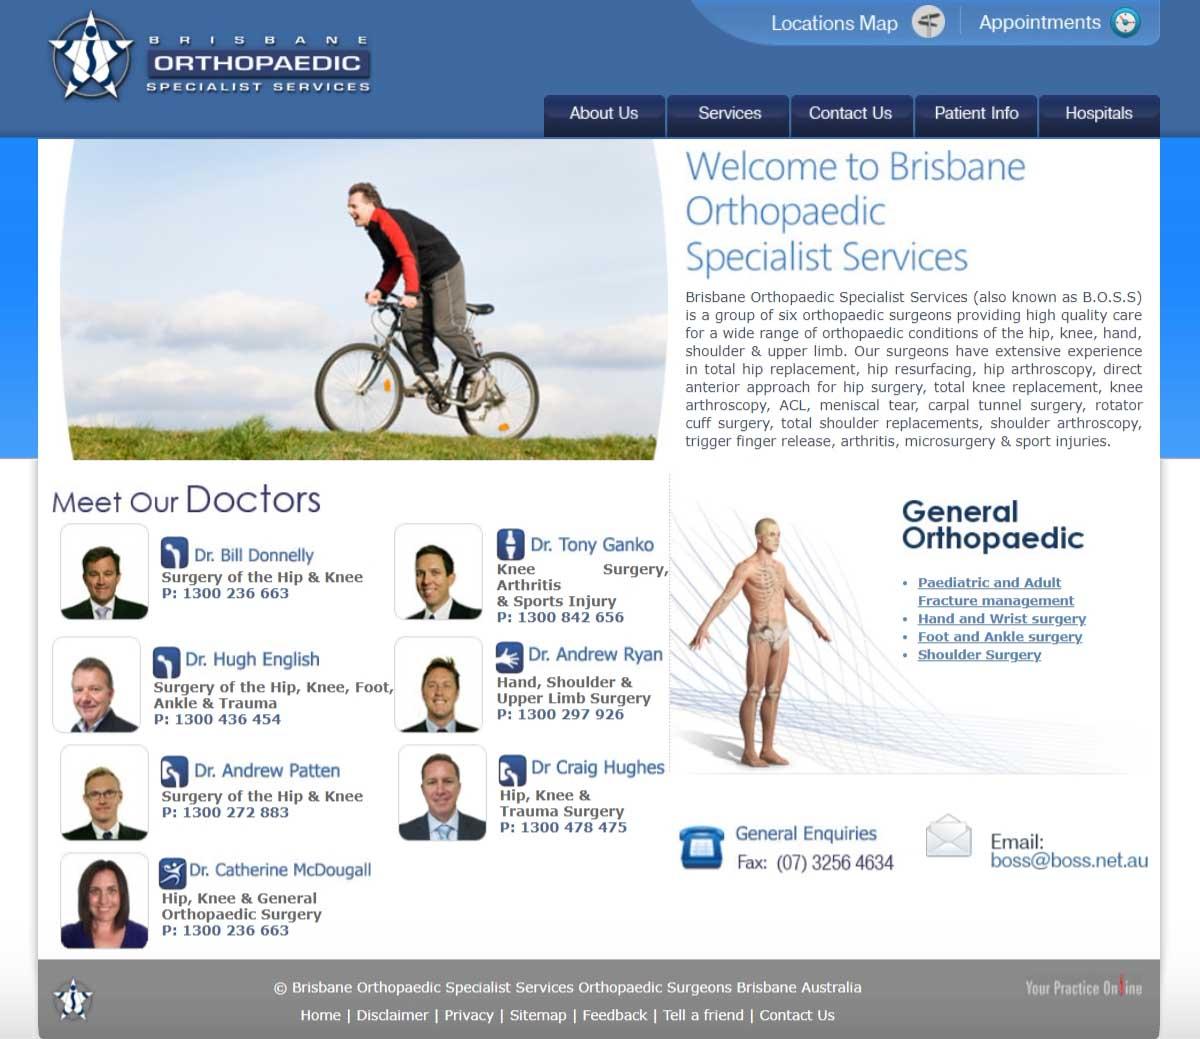 Orthopaedic Specialists Website Brisbane